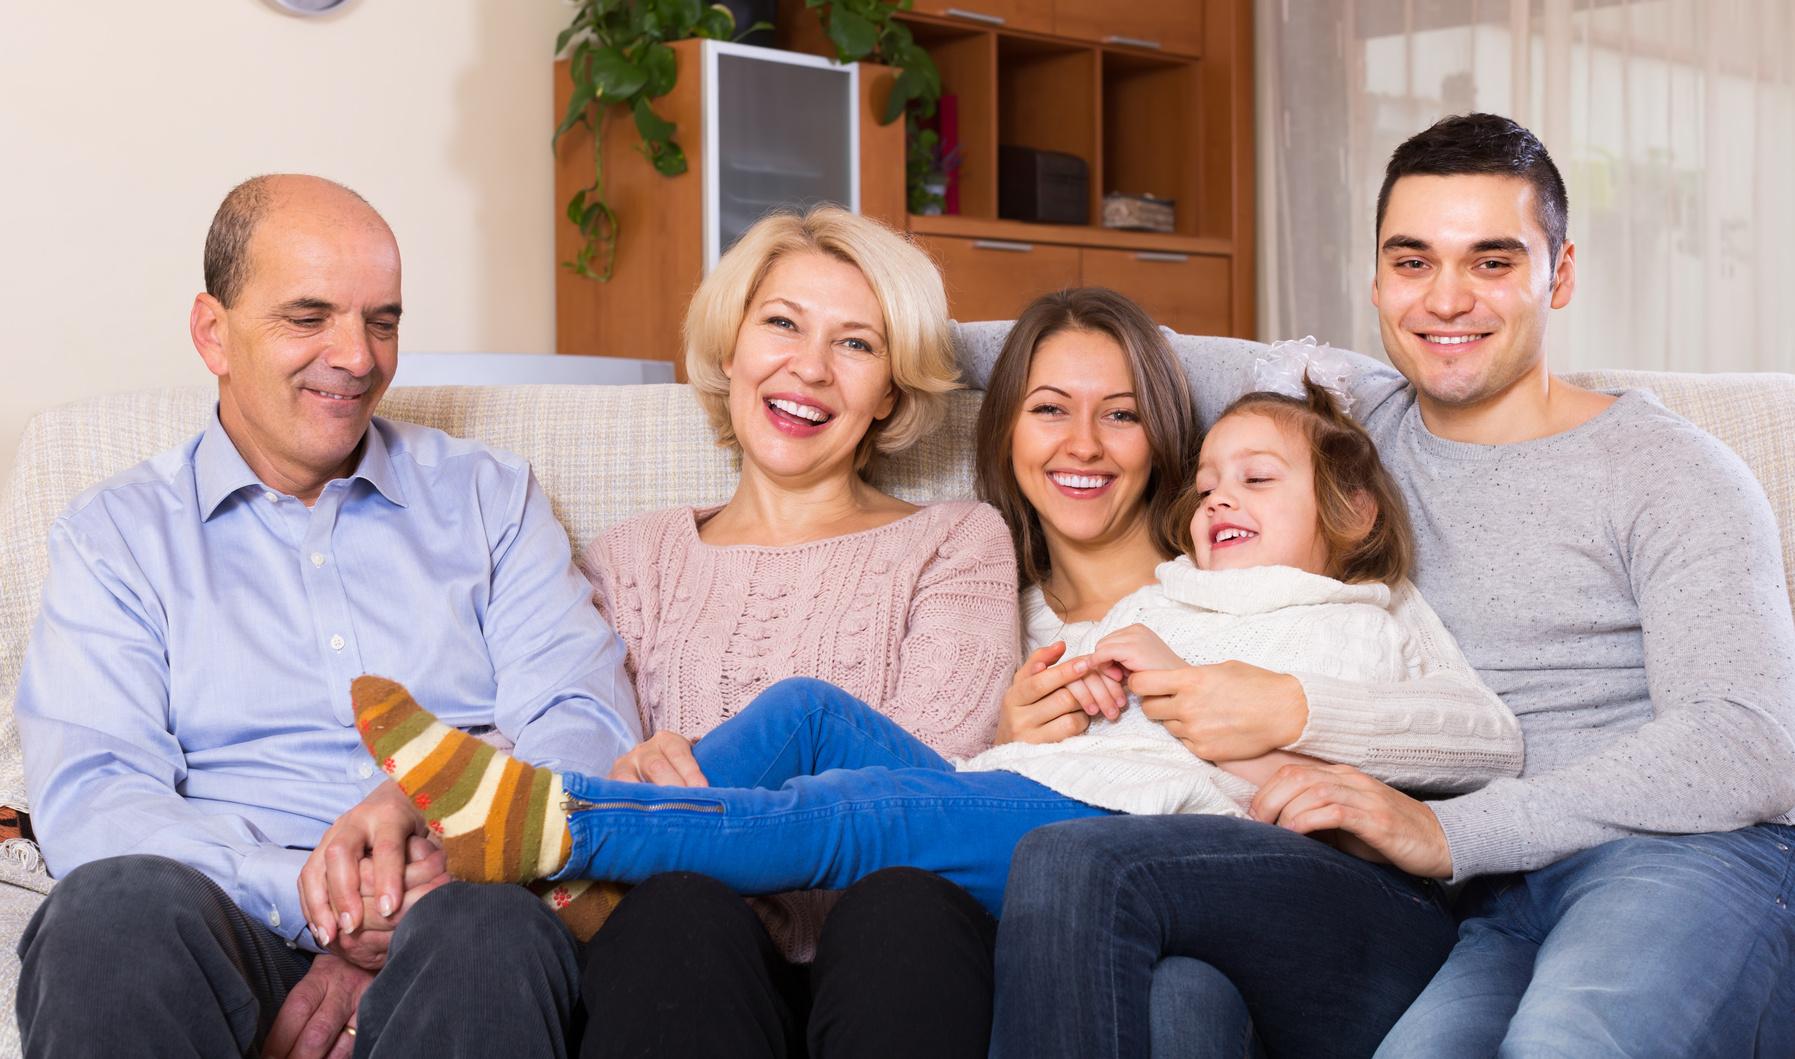 Portrait of big multigenerational family